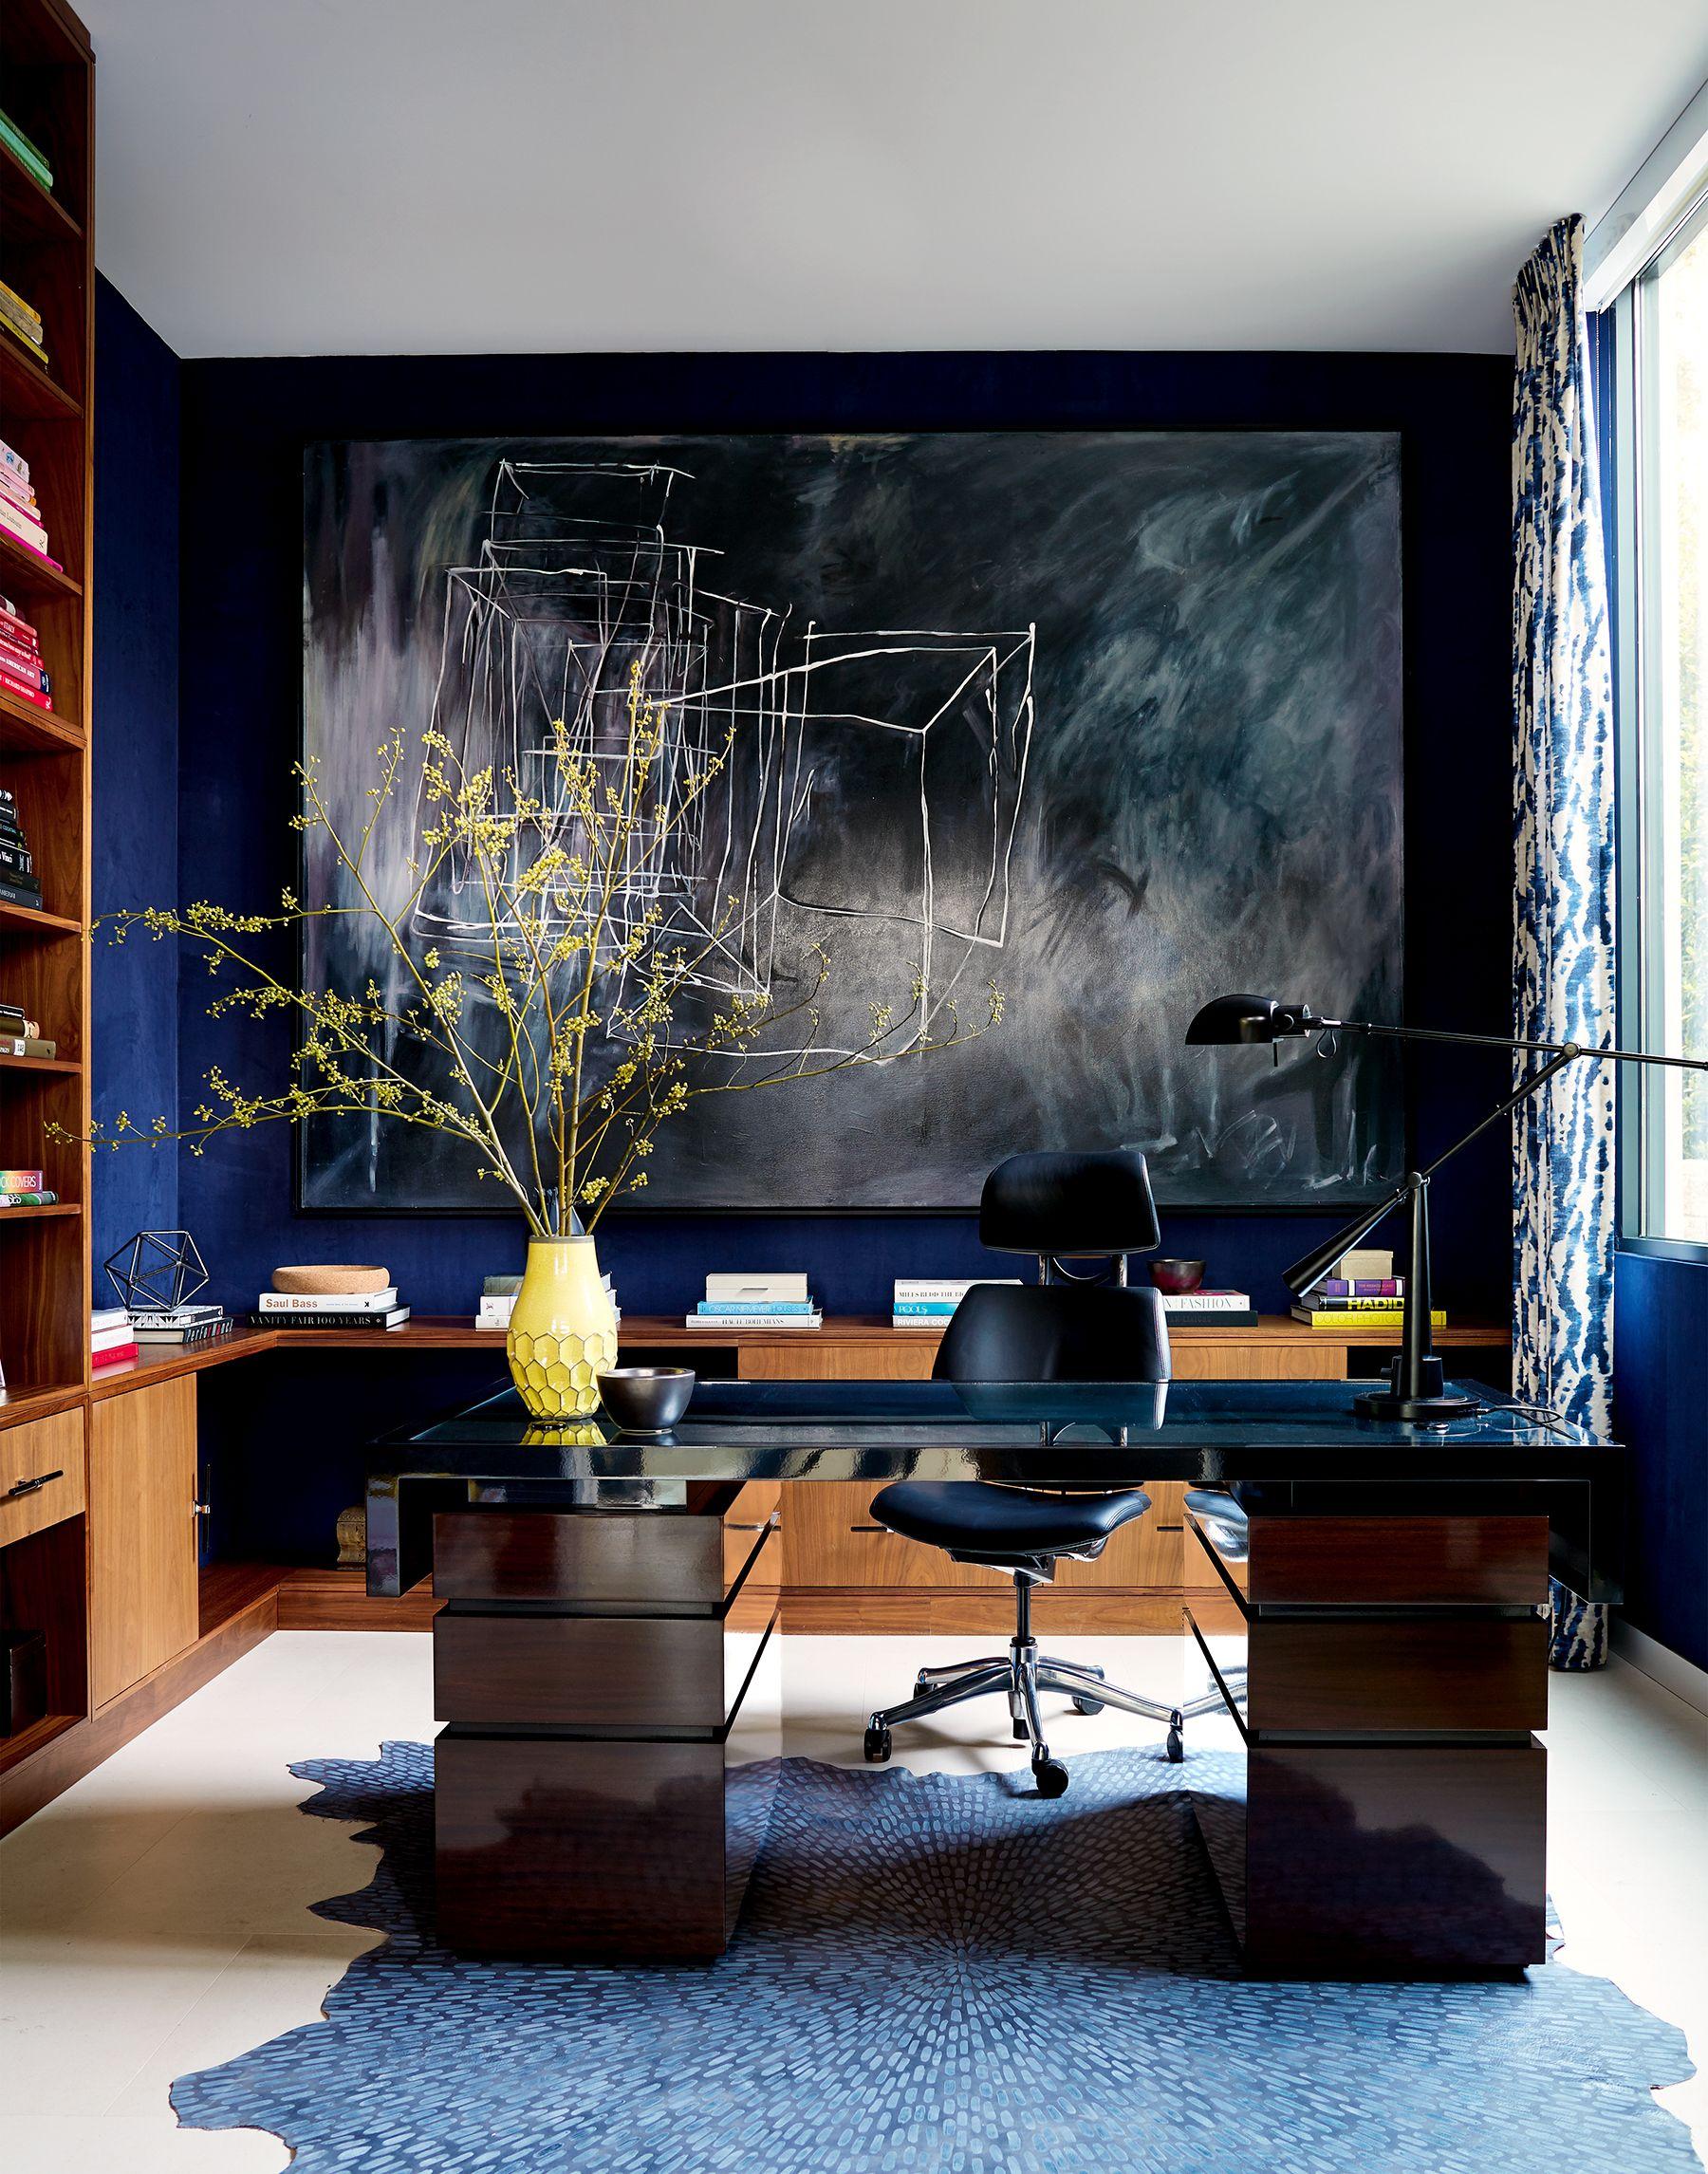 Designer Of The Day Adam Hunter With Images Residential Interior Design Interior Design Home Decor